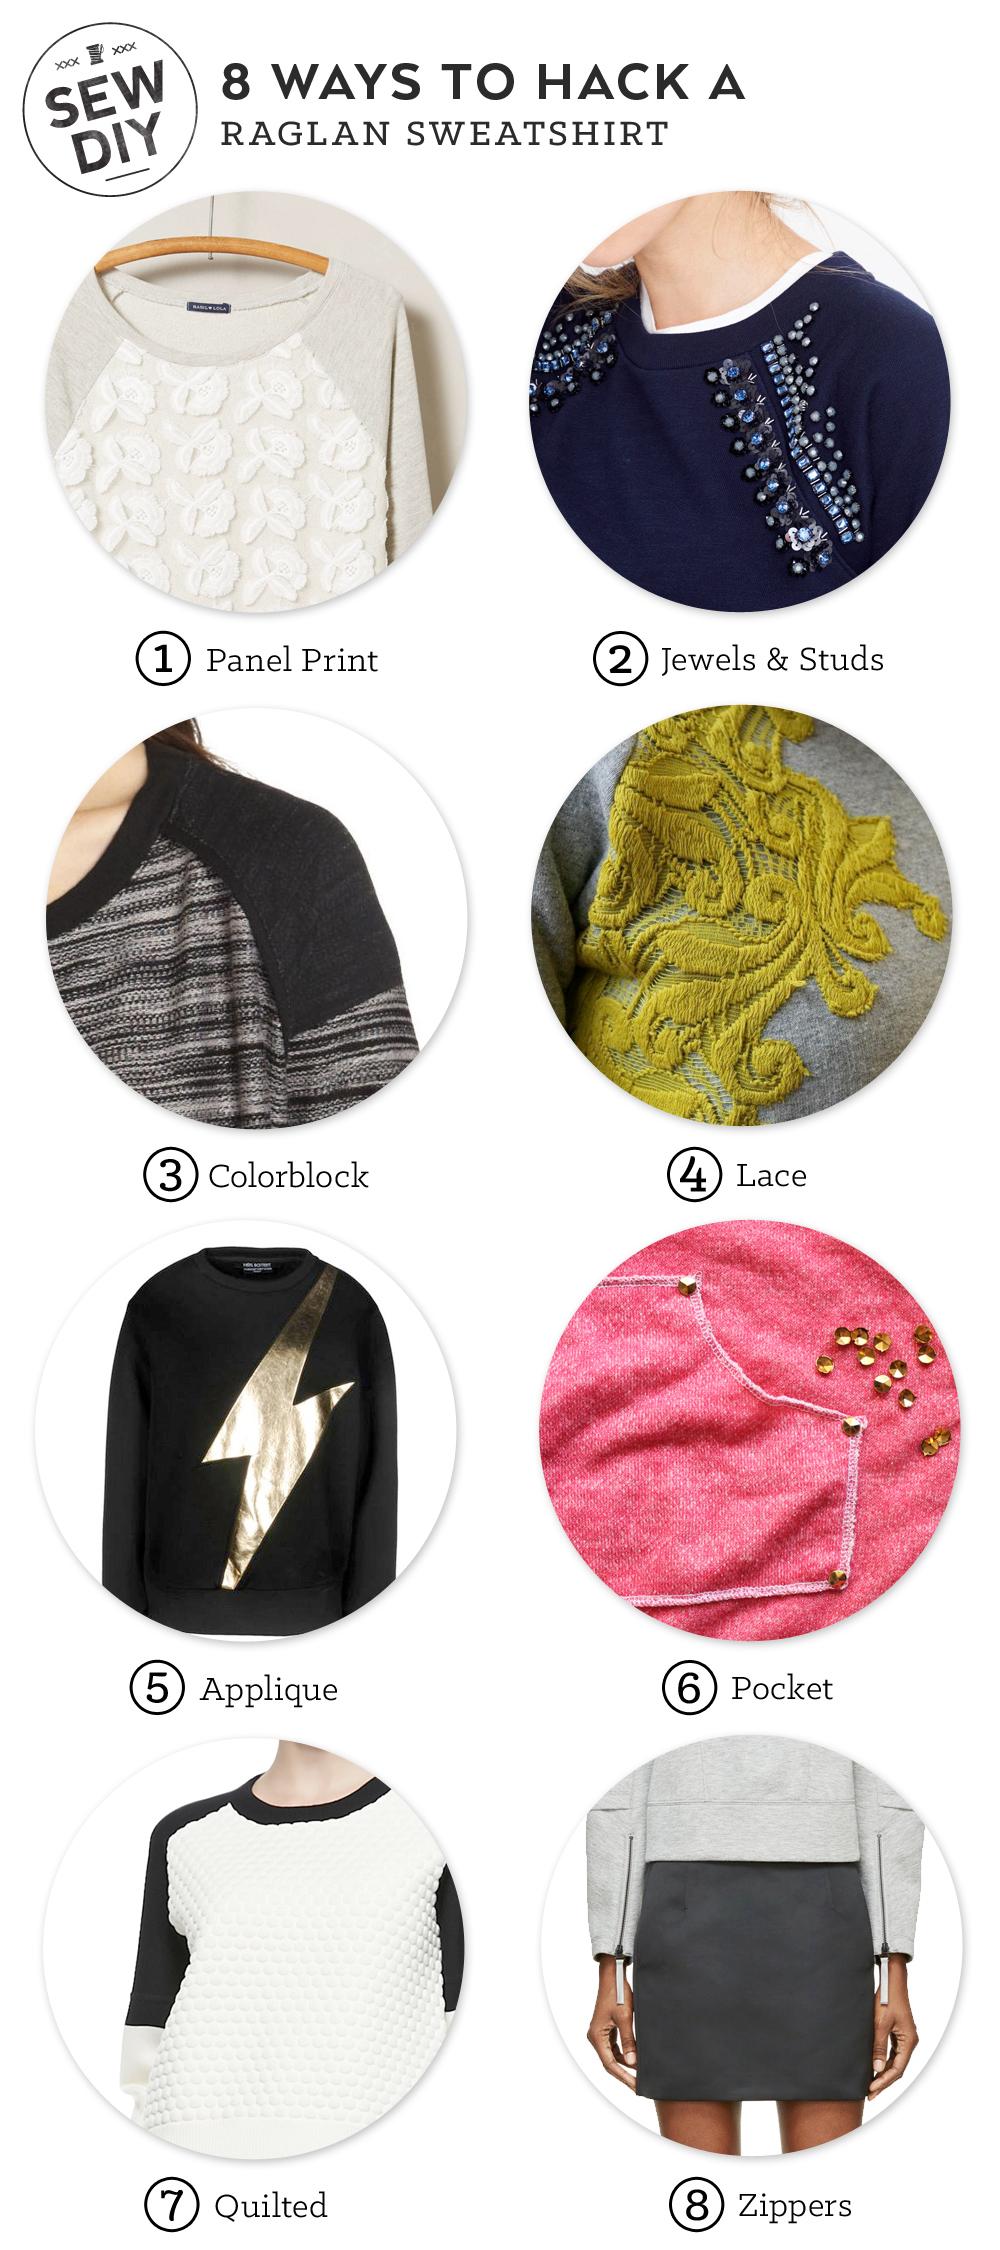 8 Ways to Hack a Raglan Sweatshirt – Sew DIY